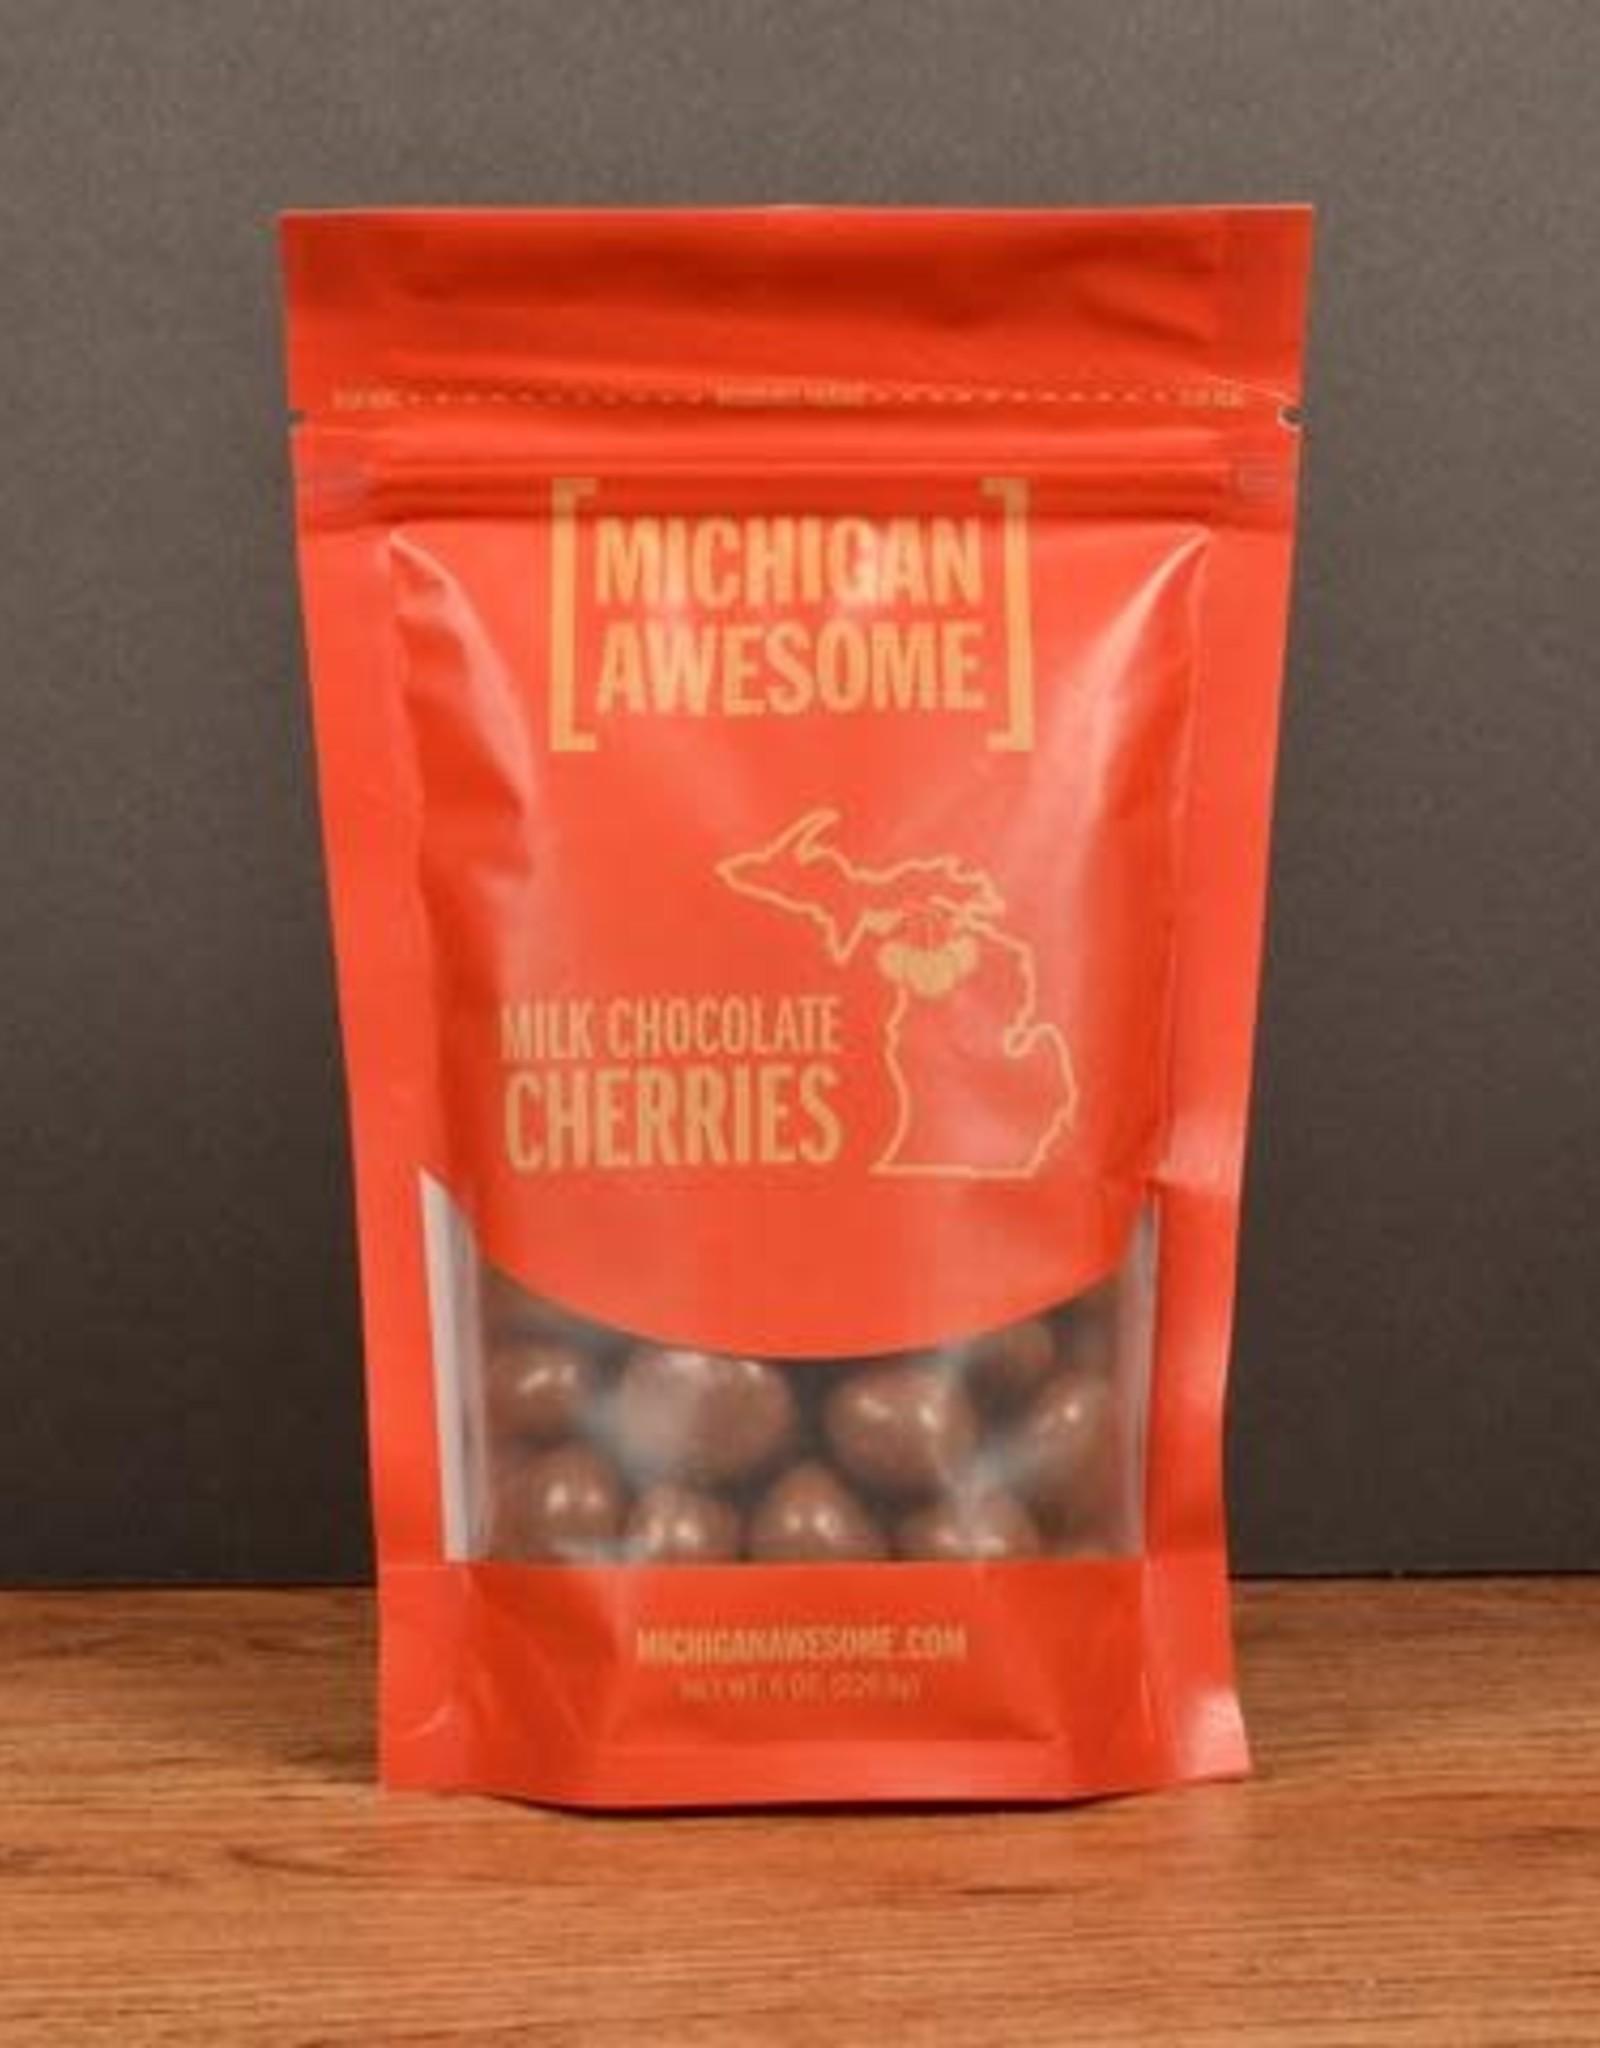 Michigan Awesome Michigan Awesome | Milk Chocolate Cherries